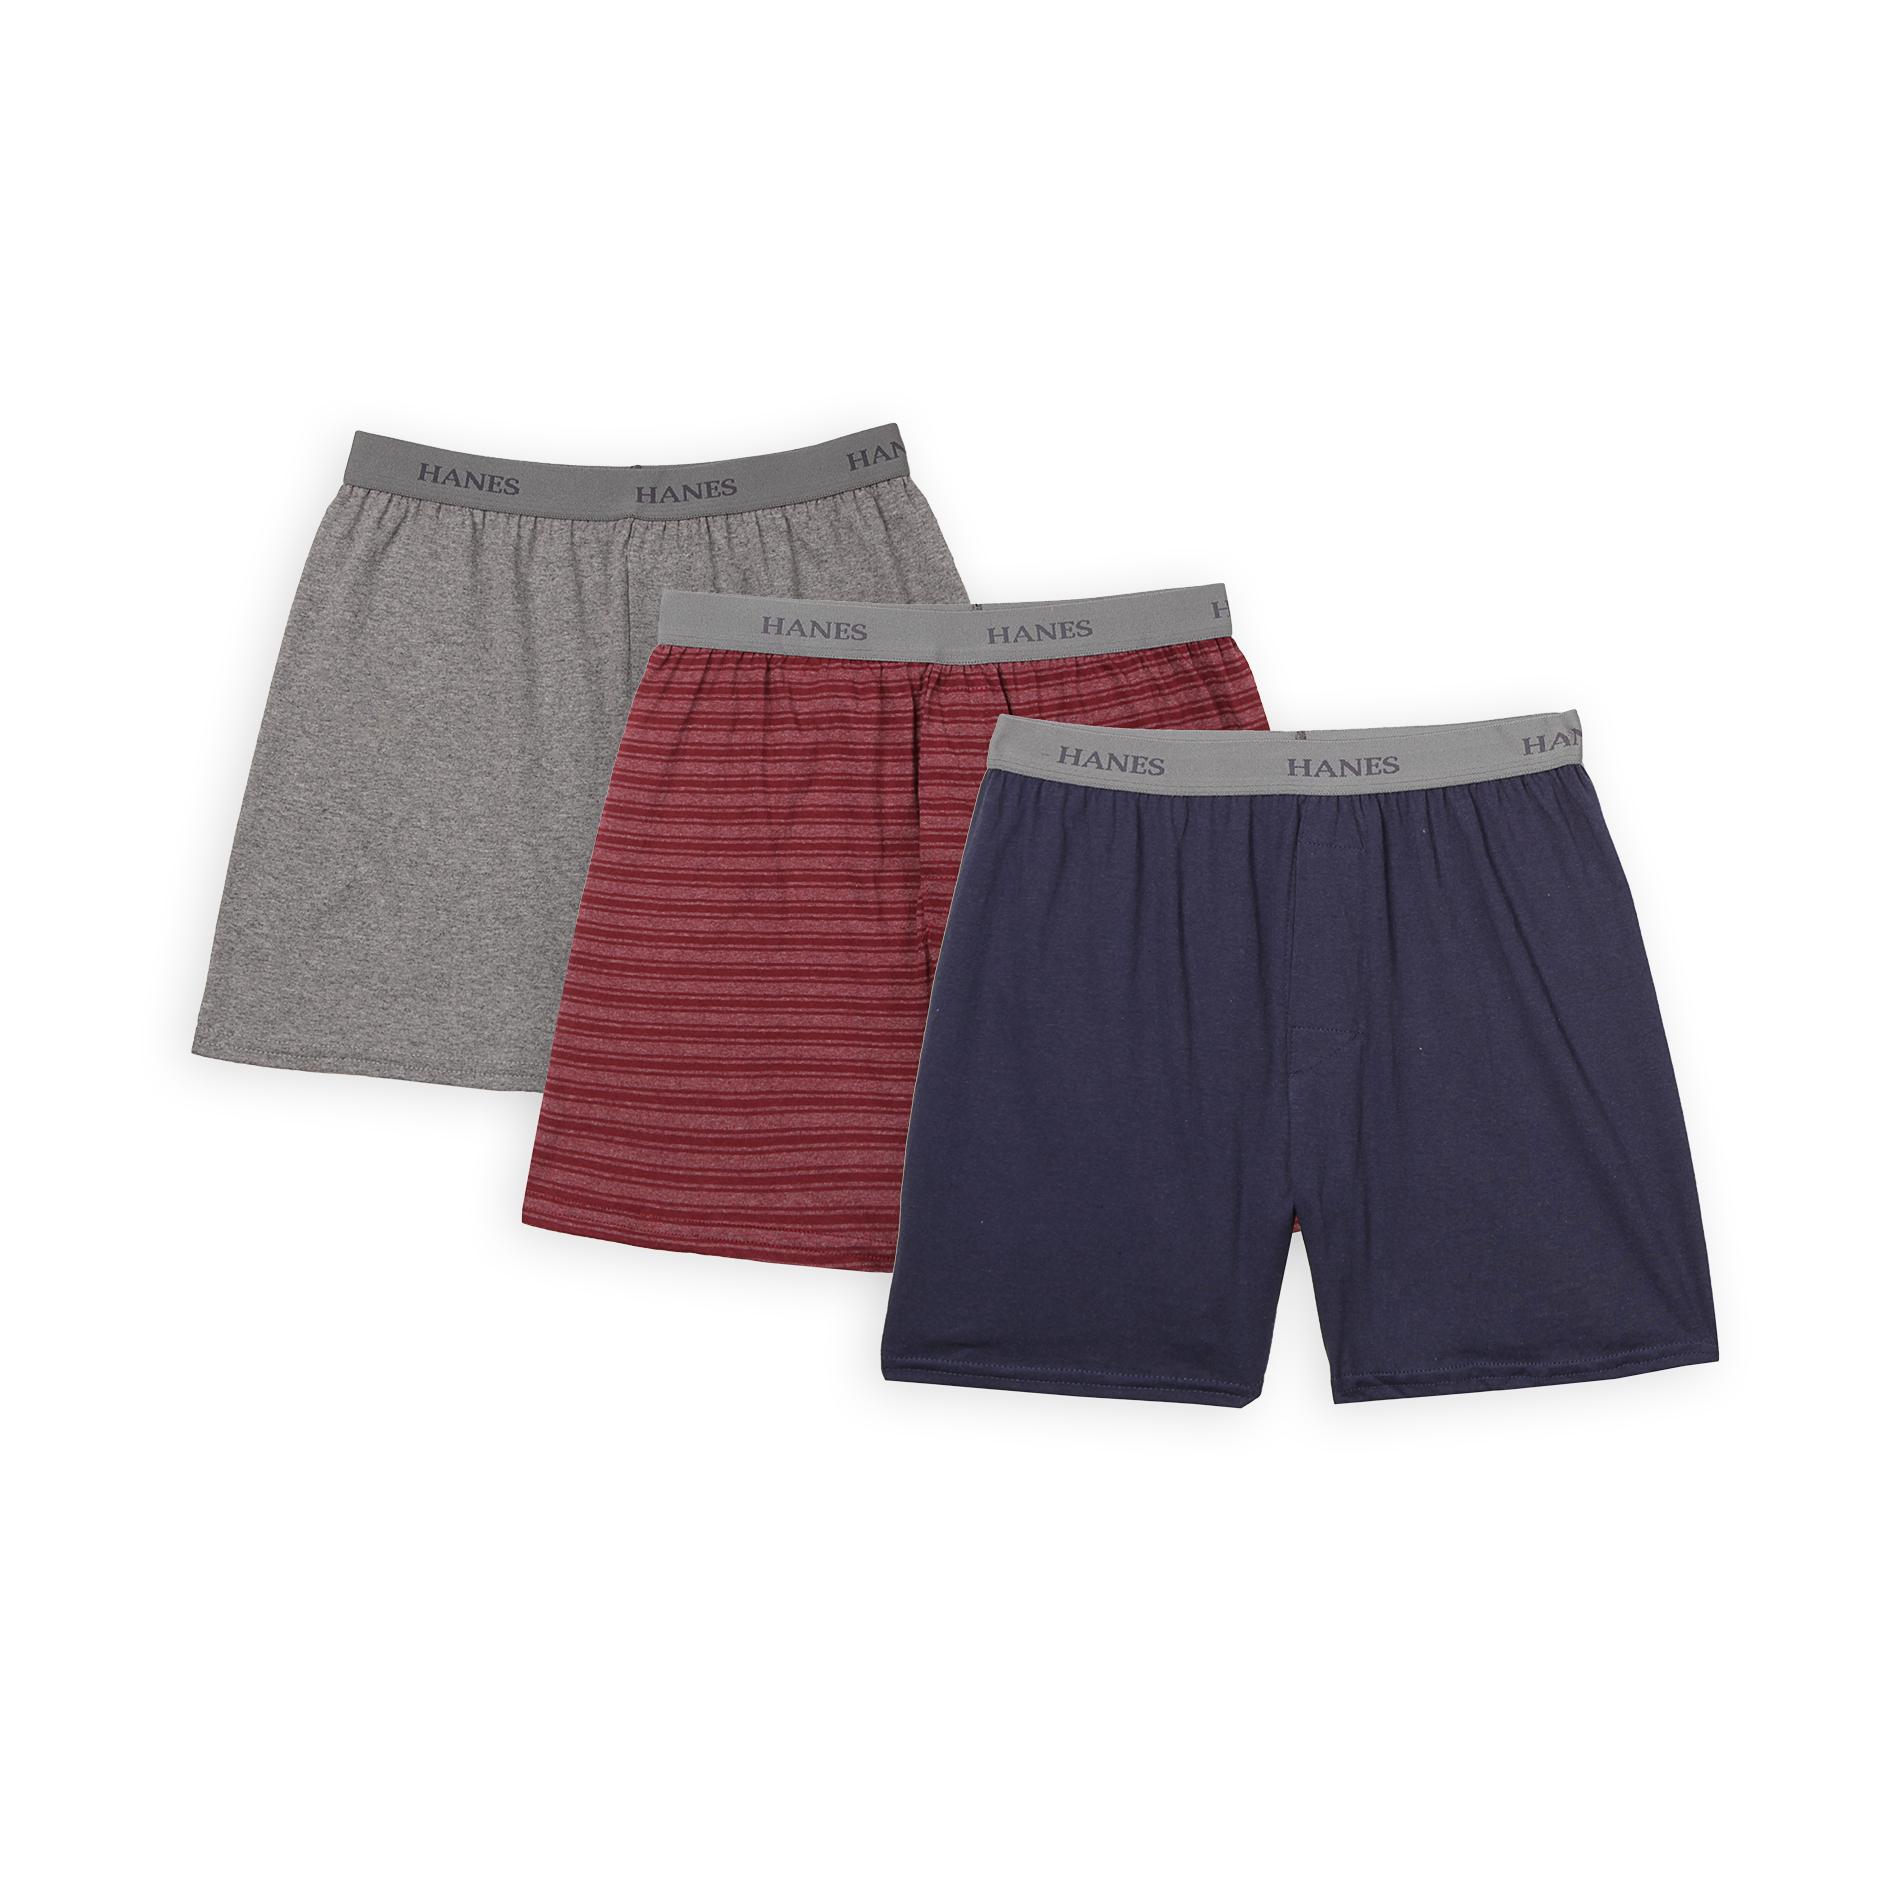 Hanes Boy's Boxer Shorts - 3 Pack